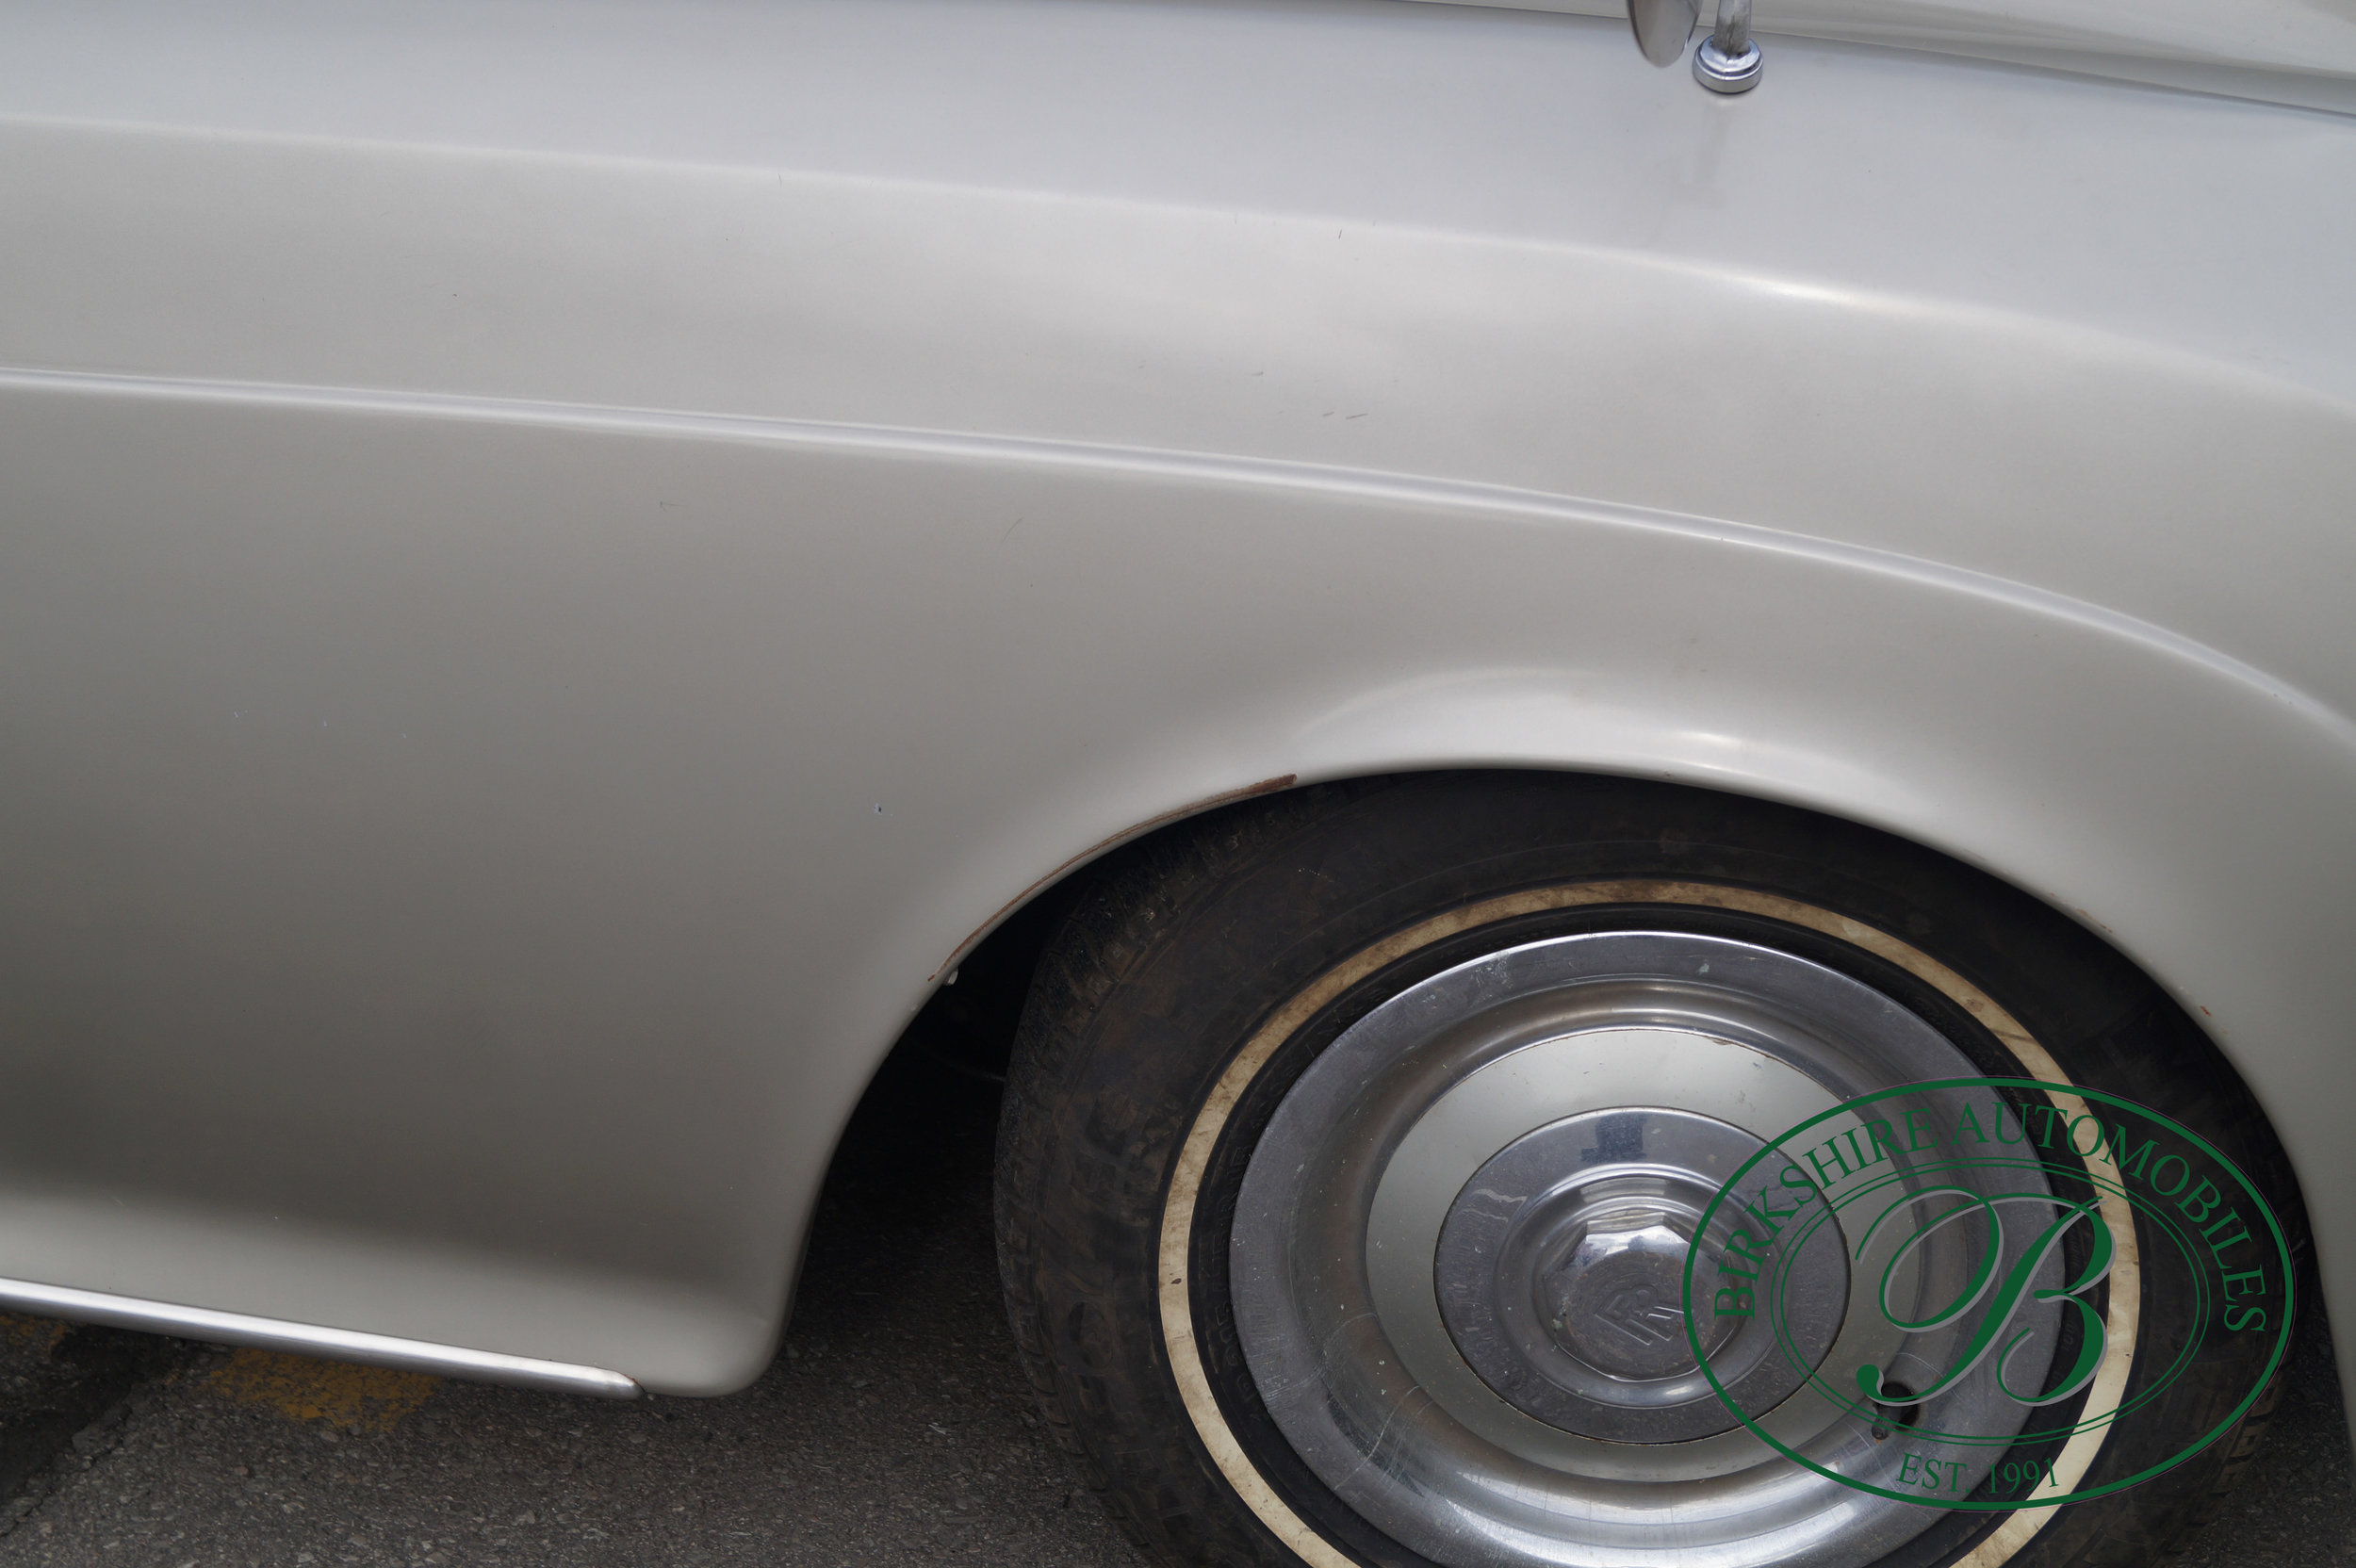 Birkshire Automobiles 1960 Rolls Royce Silver Cloud-11.jpg